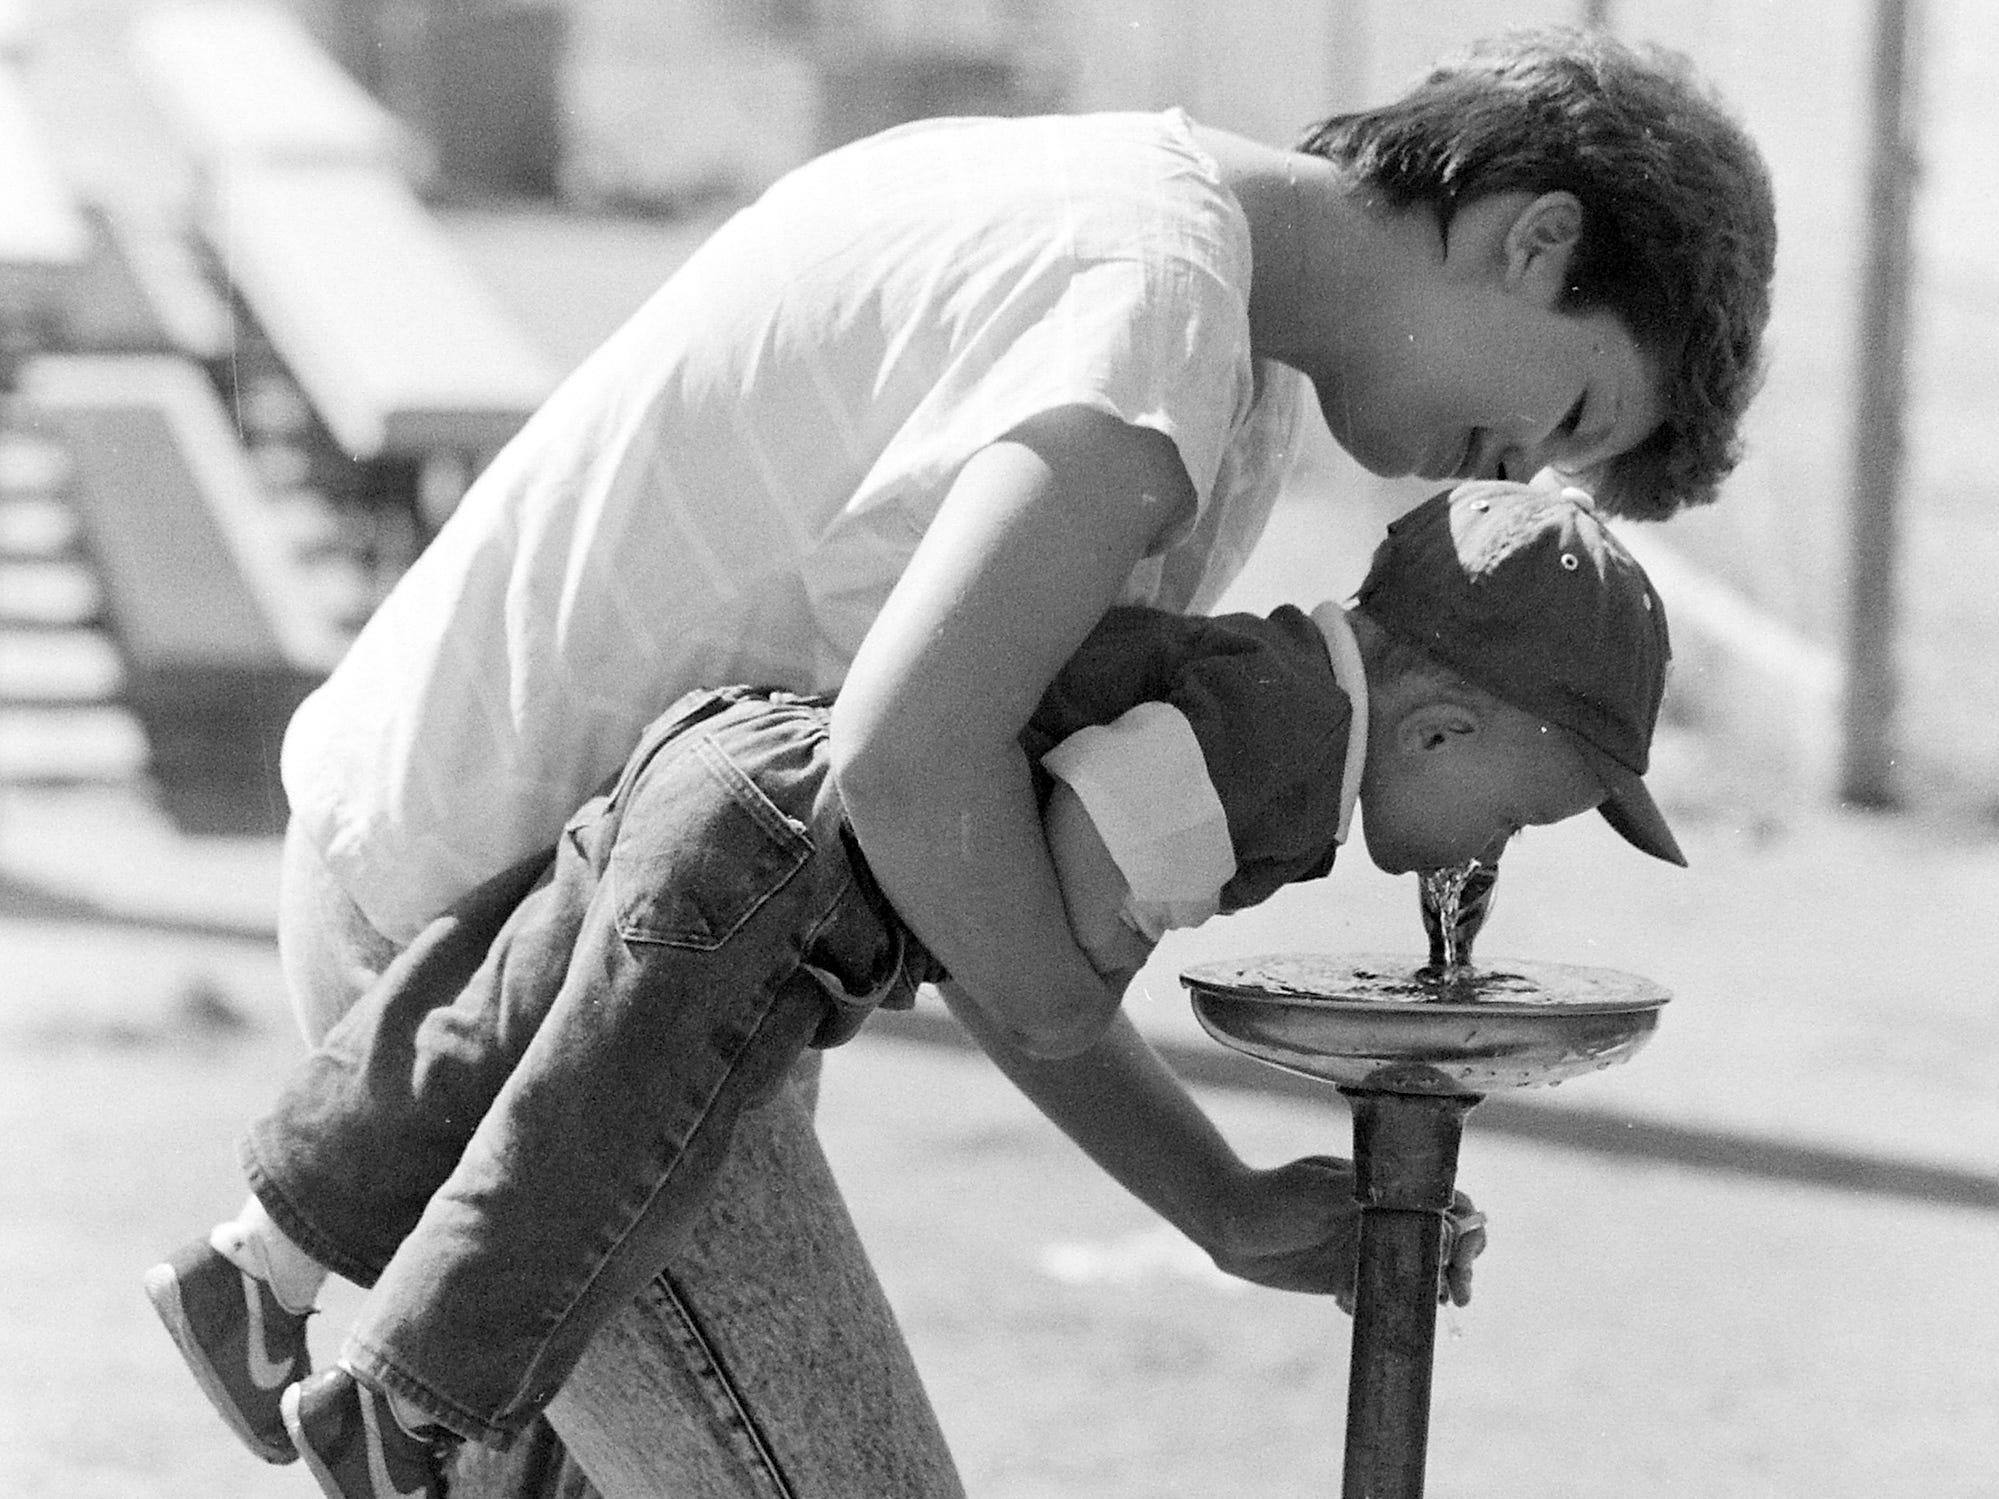 06/03/88Boy Getting Drink of Water